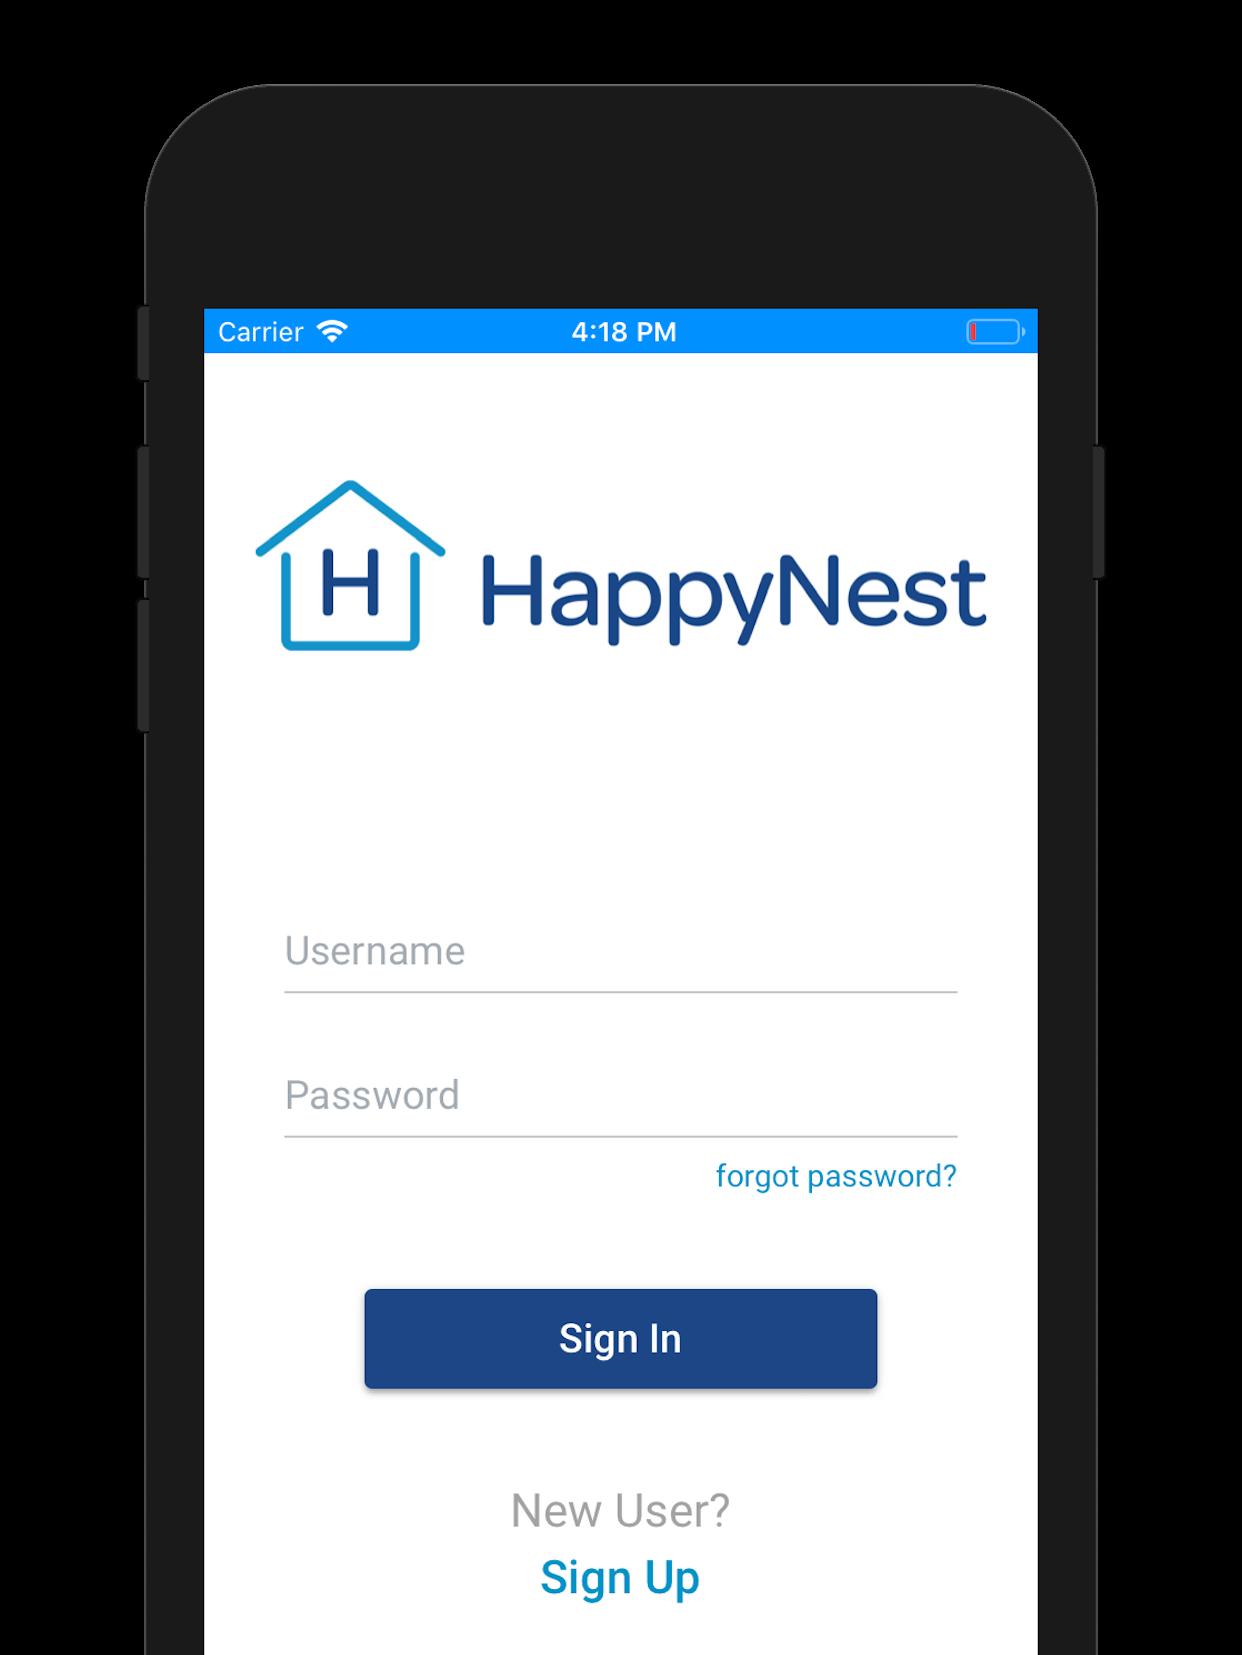 HappyNest Phone